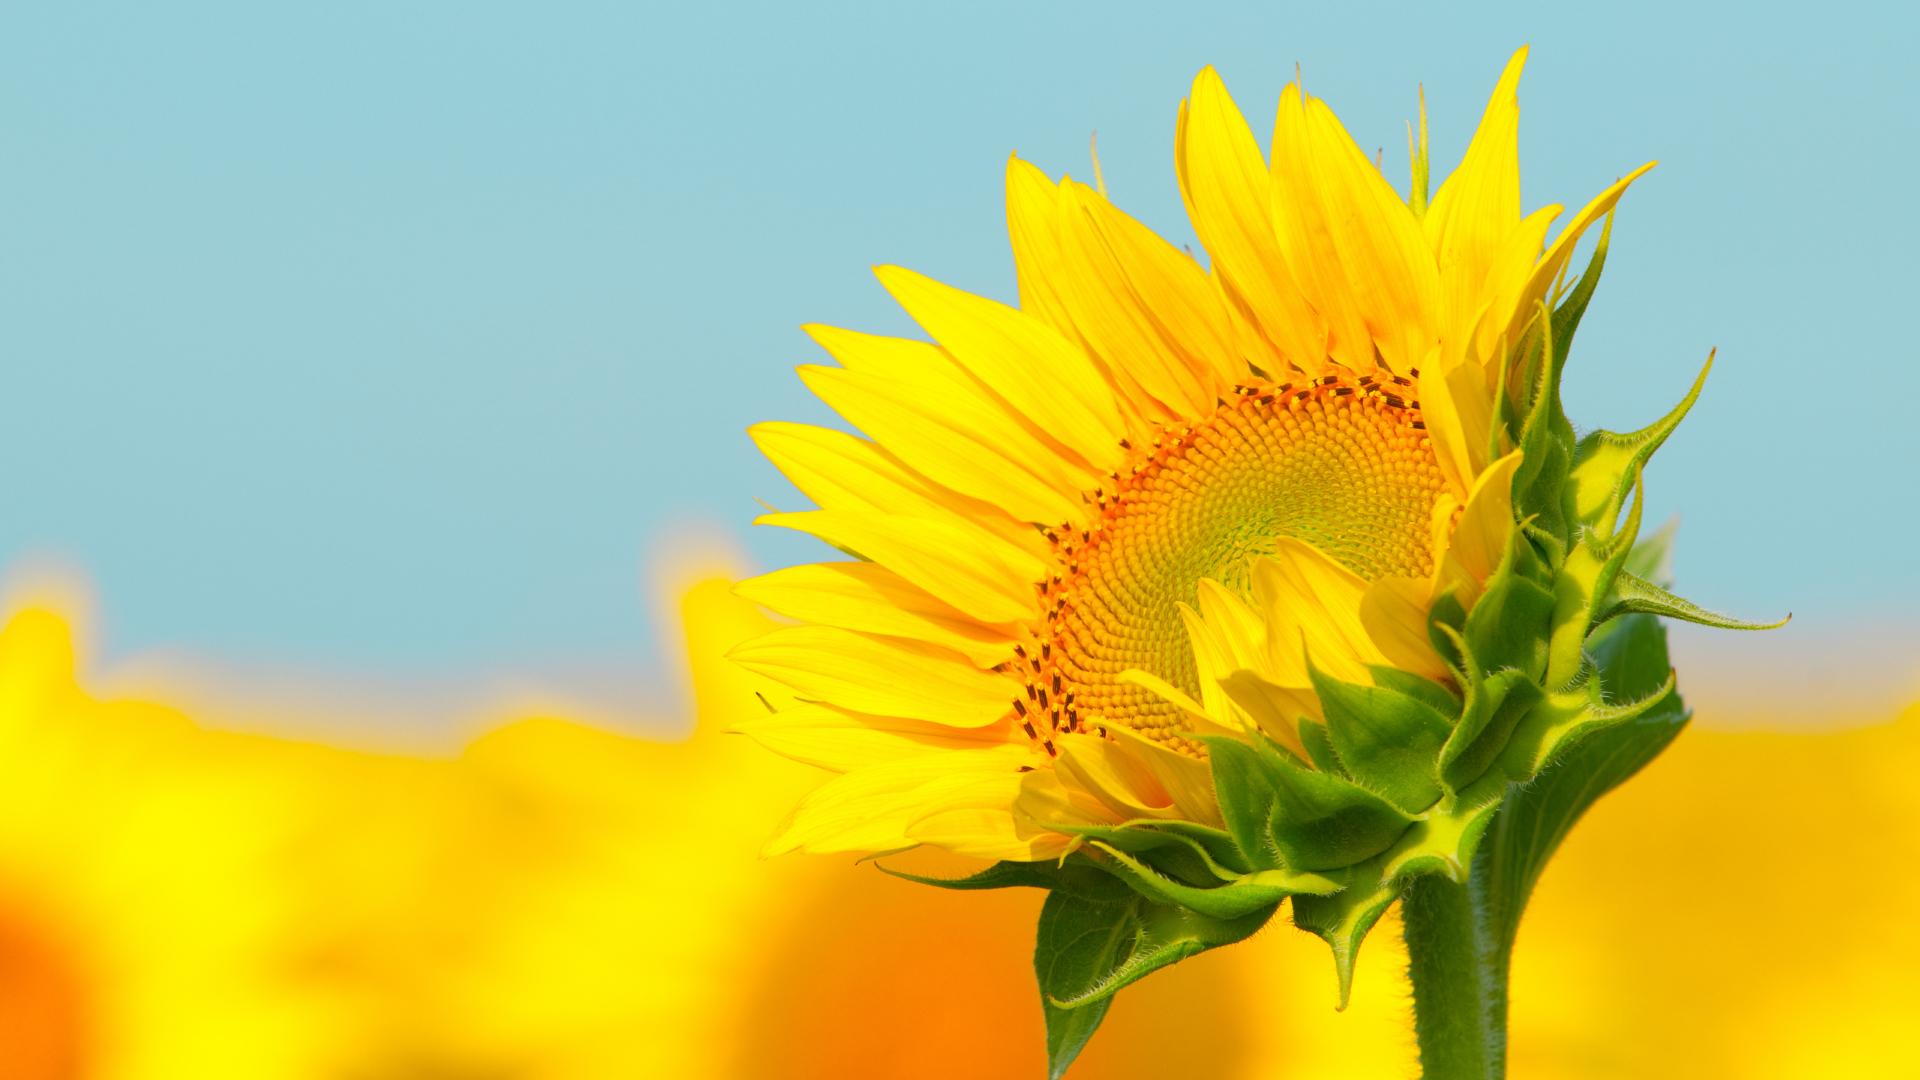 1920x1080 Sunflowers Macro 1080P Laptop Full HD Wallpaper